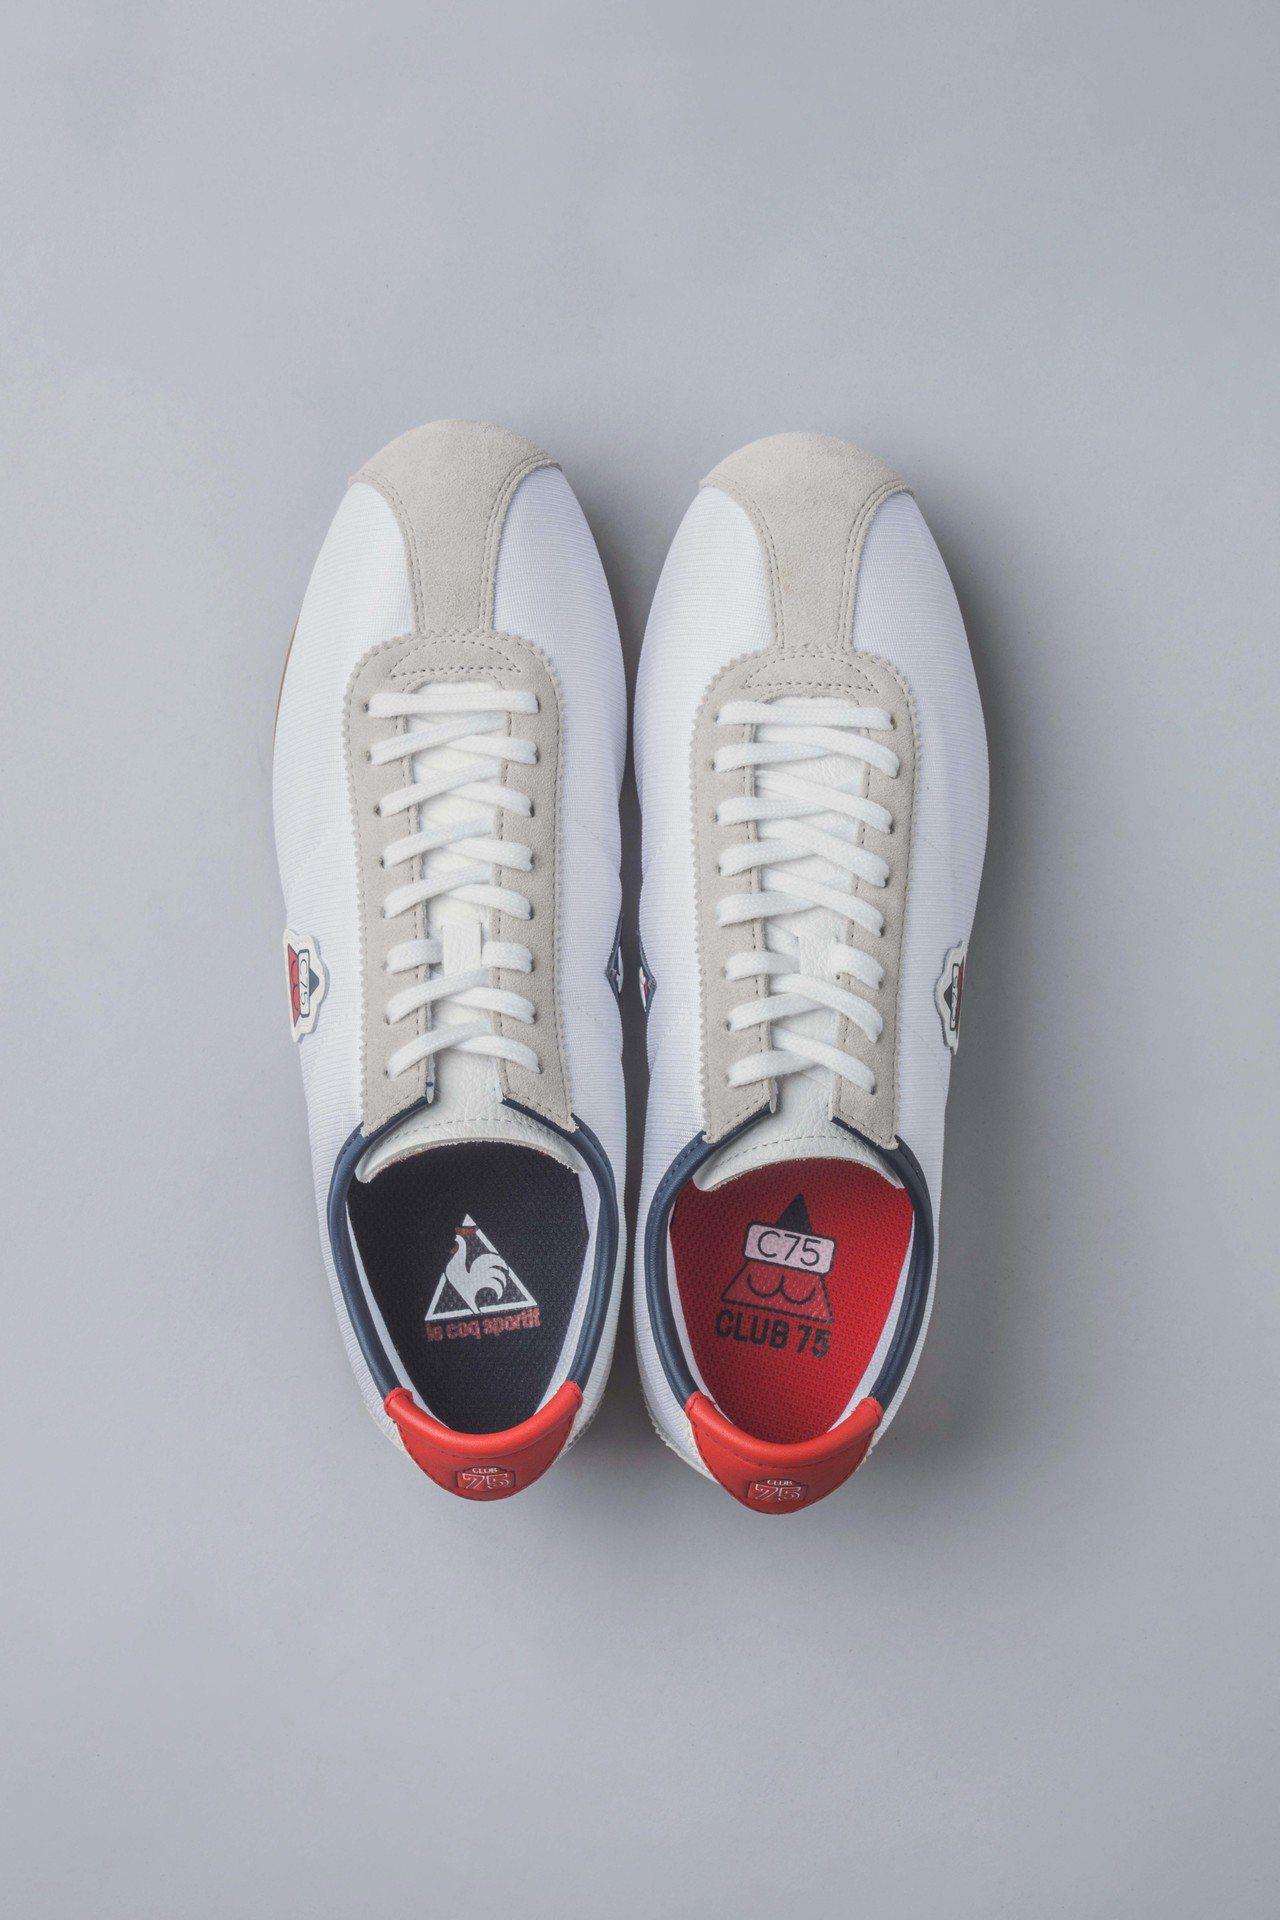 le coq sportif與Club 75聯名系列Montpellier鞋款鞋...